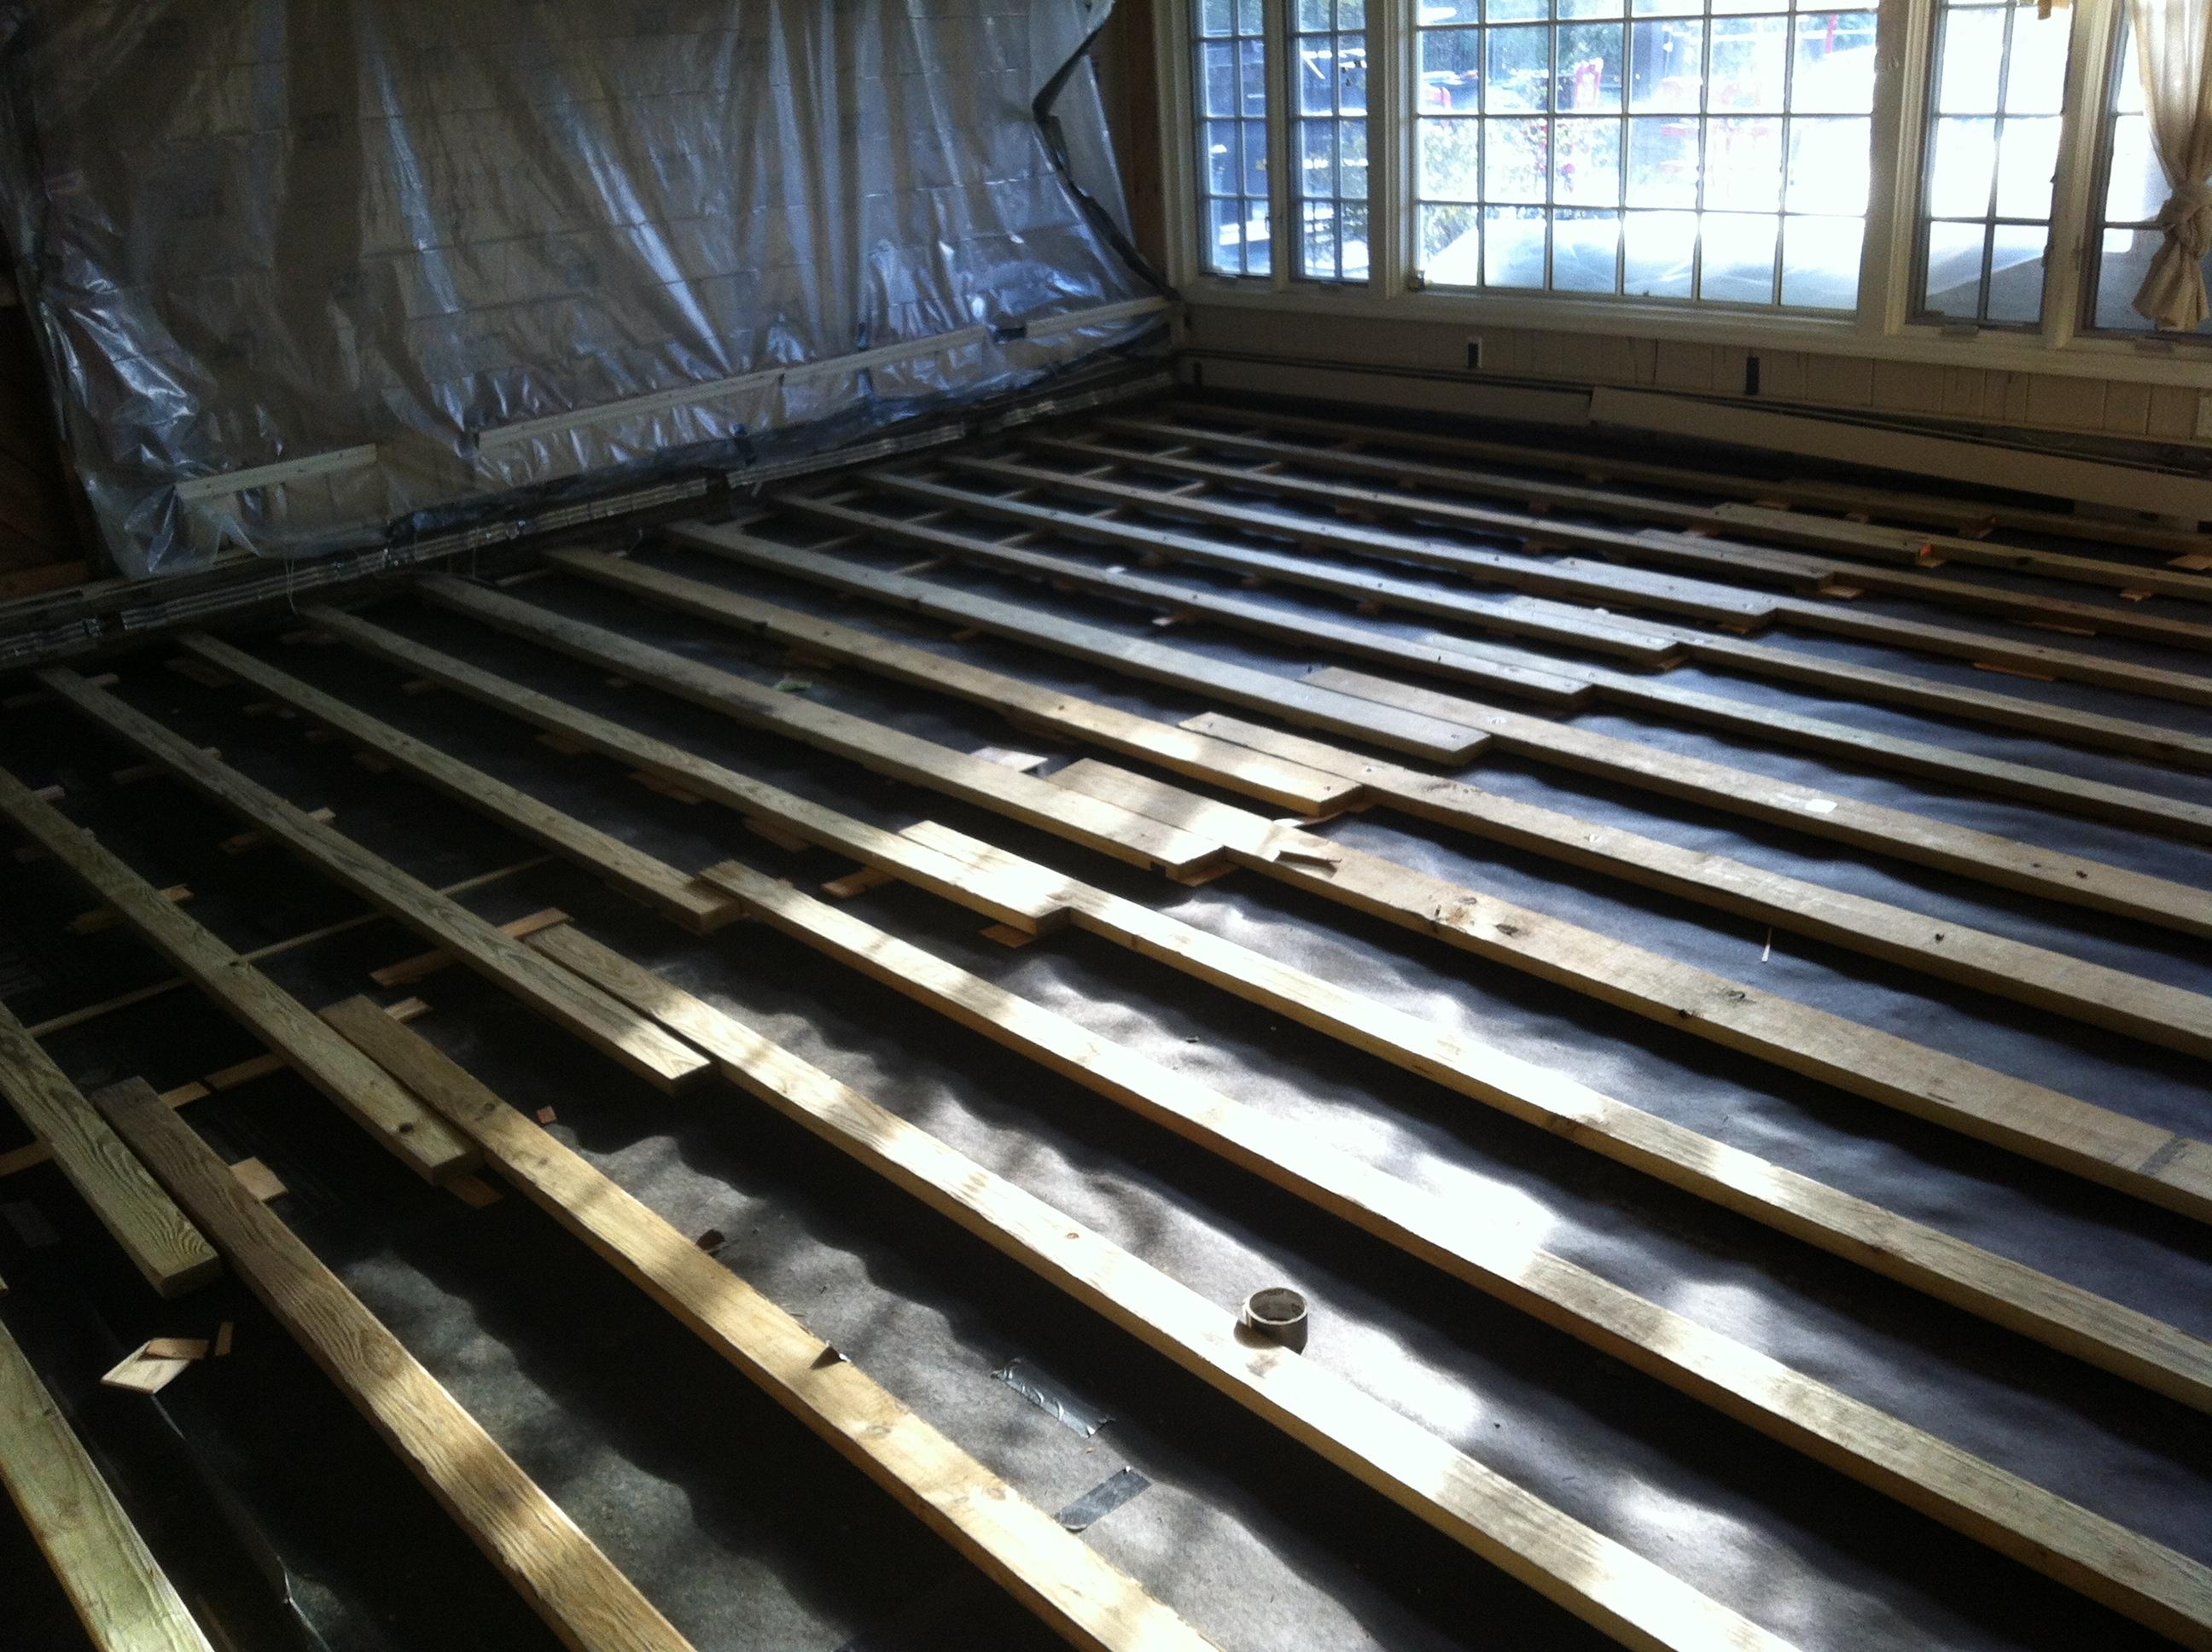 2 4 Sleepers Shimmed Over Concrete Slab